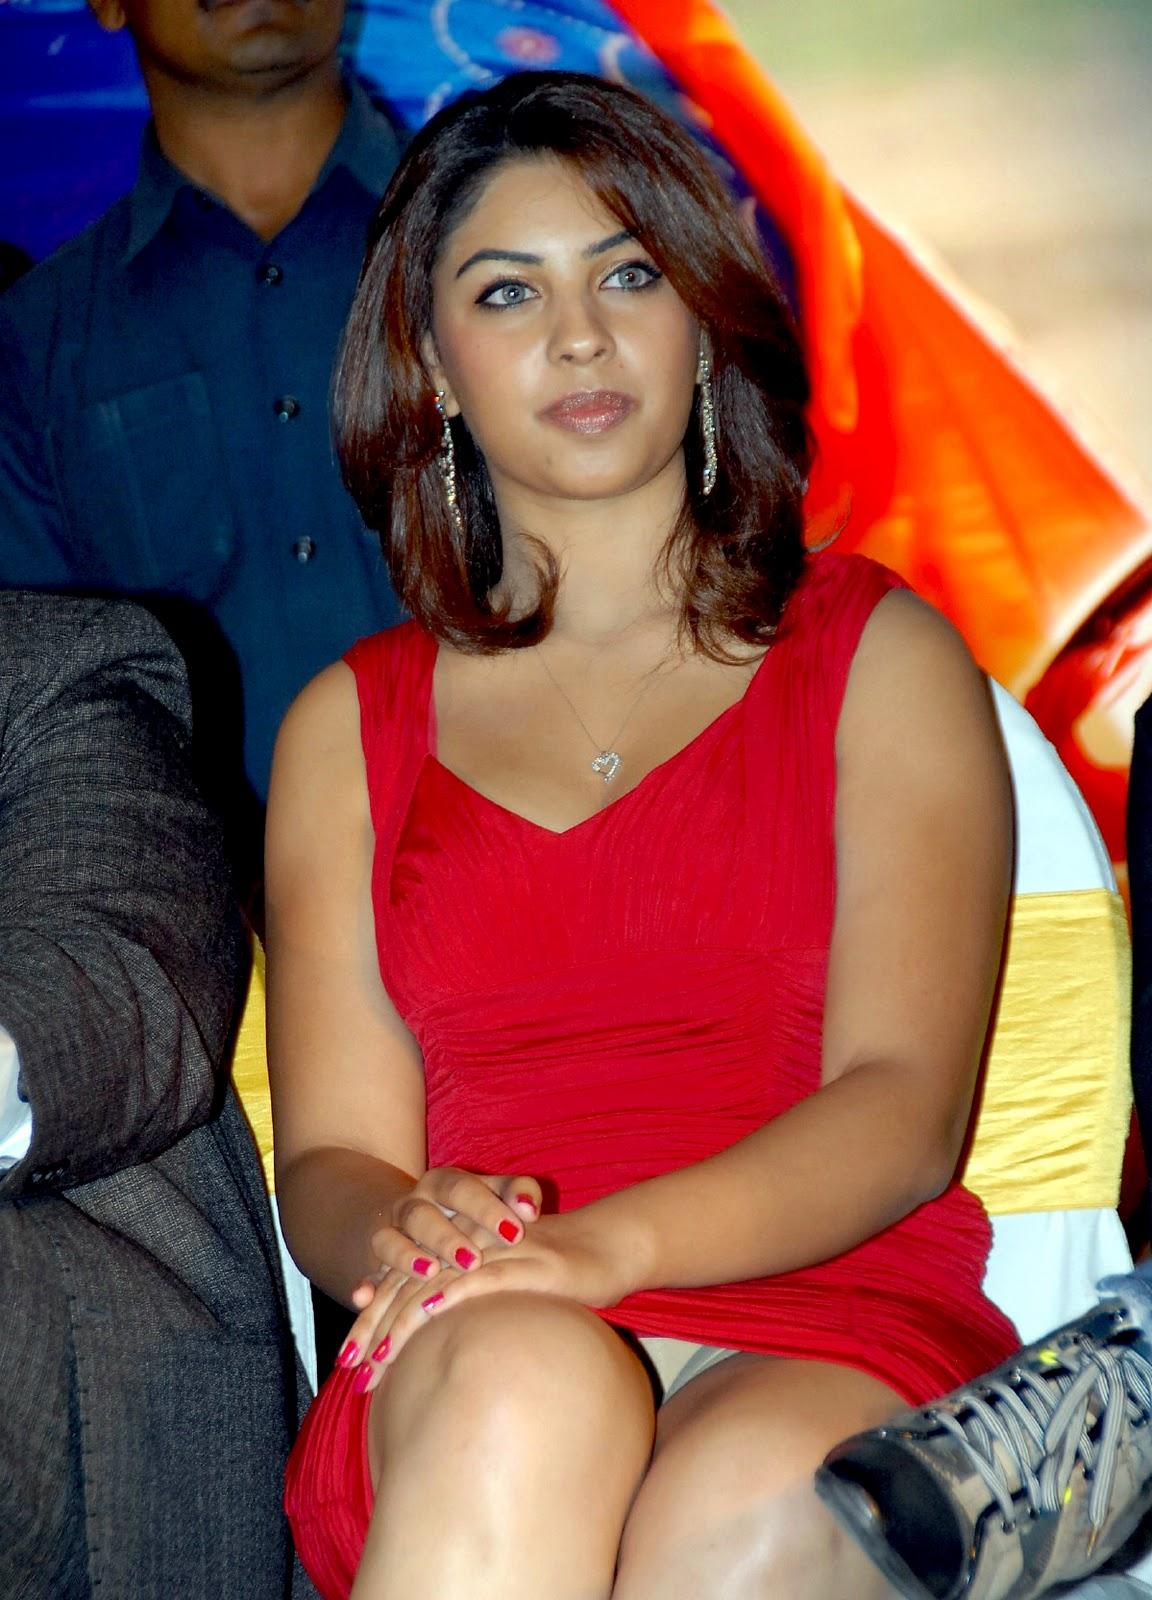 Richa Gangopadhyay In Mirapakaya 'richa gangopadhyay' at